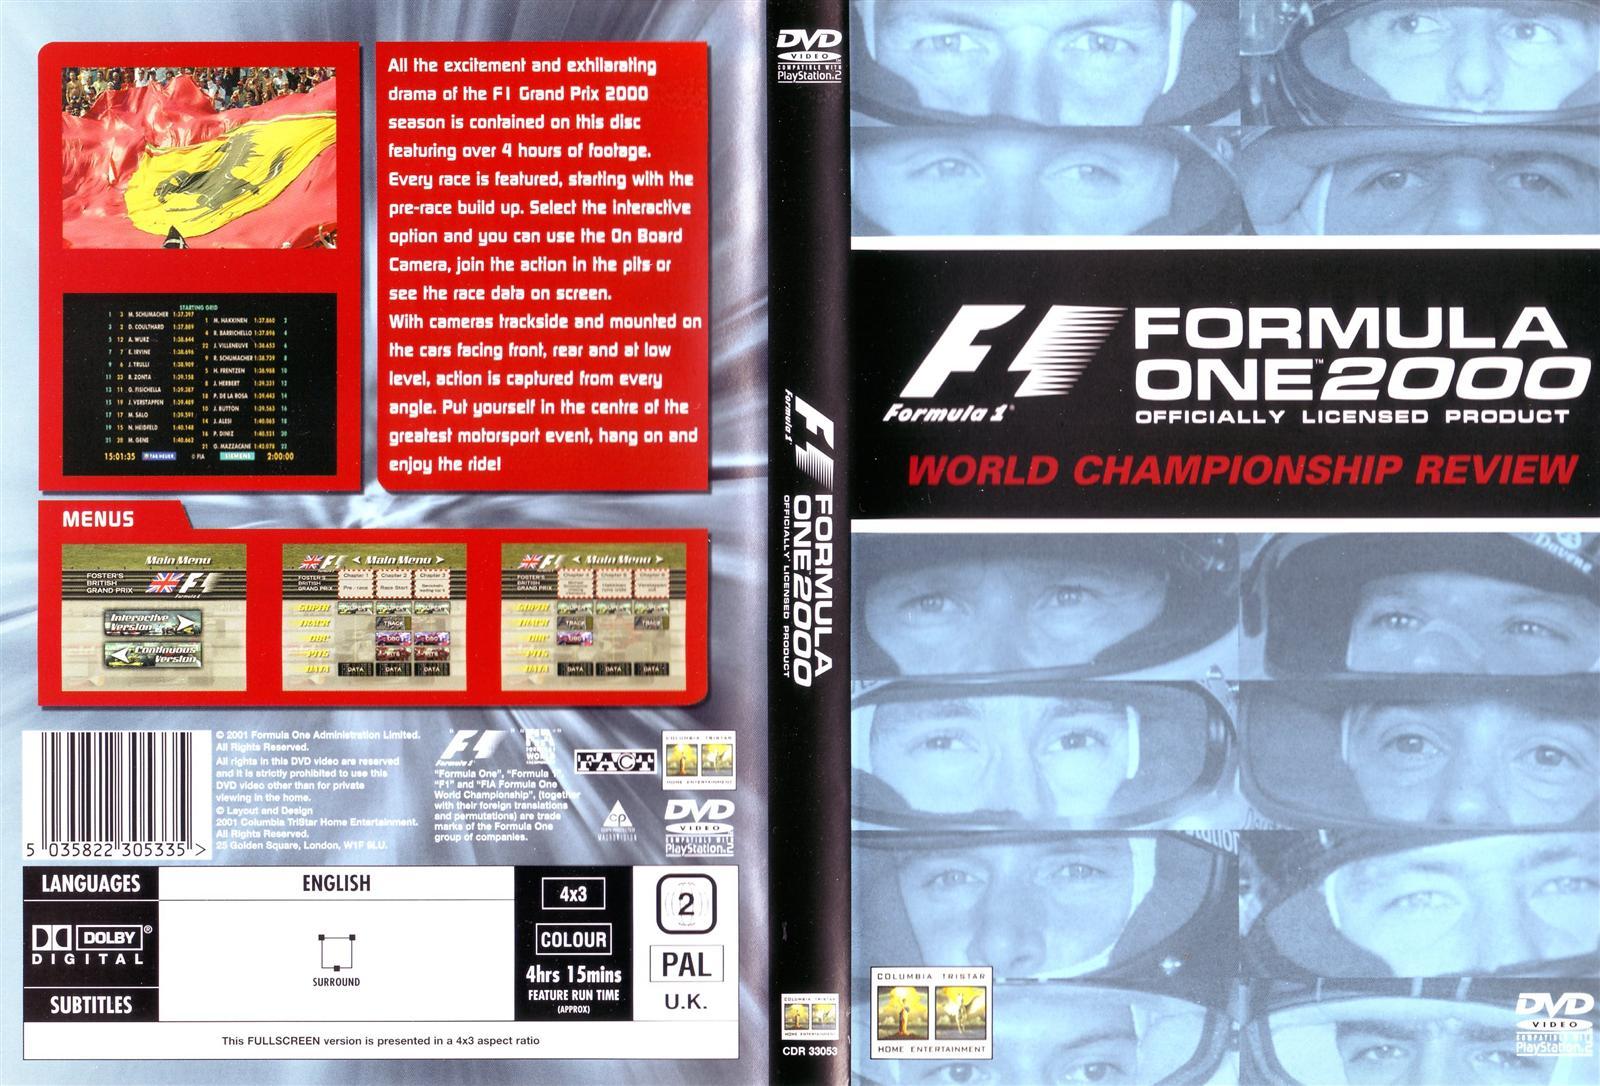 F Dvd on Nascar Racing